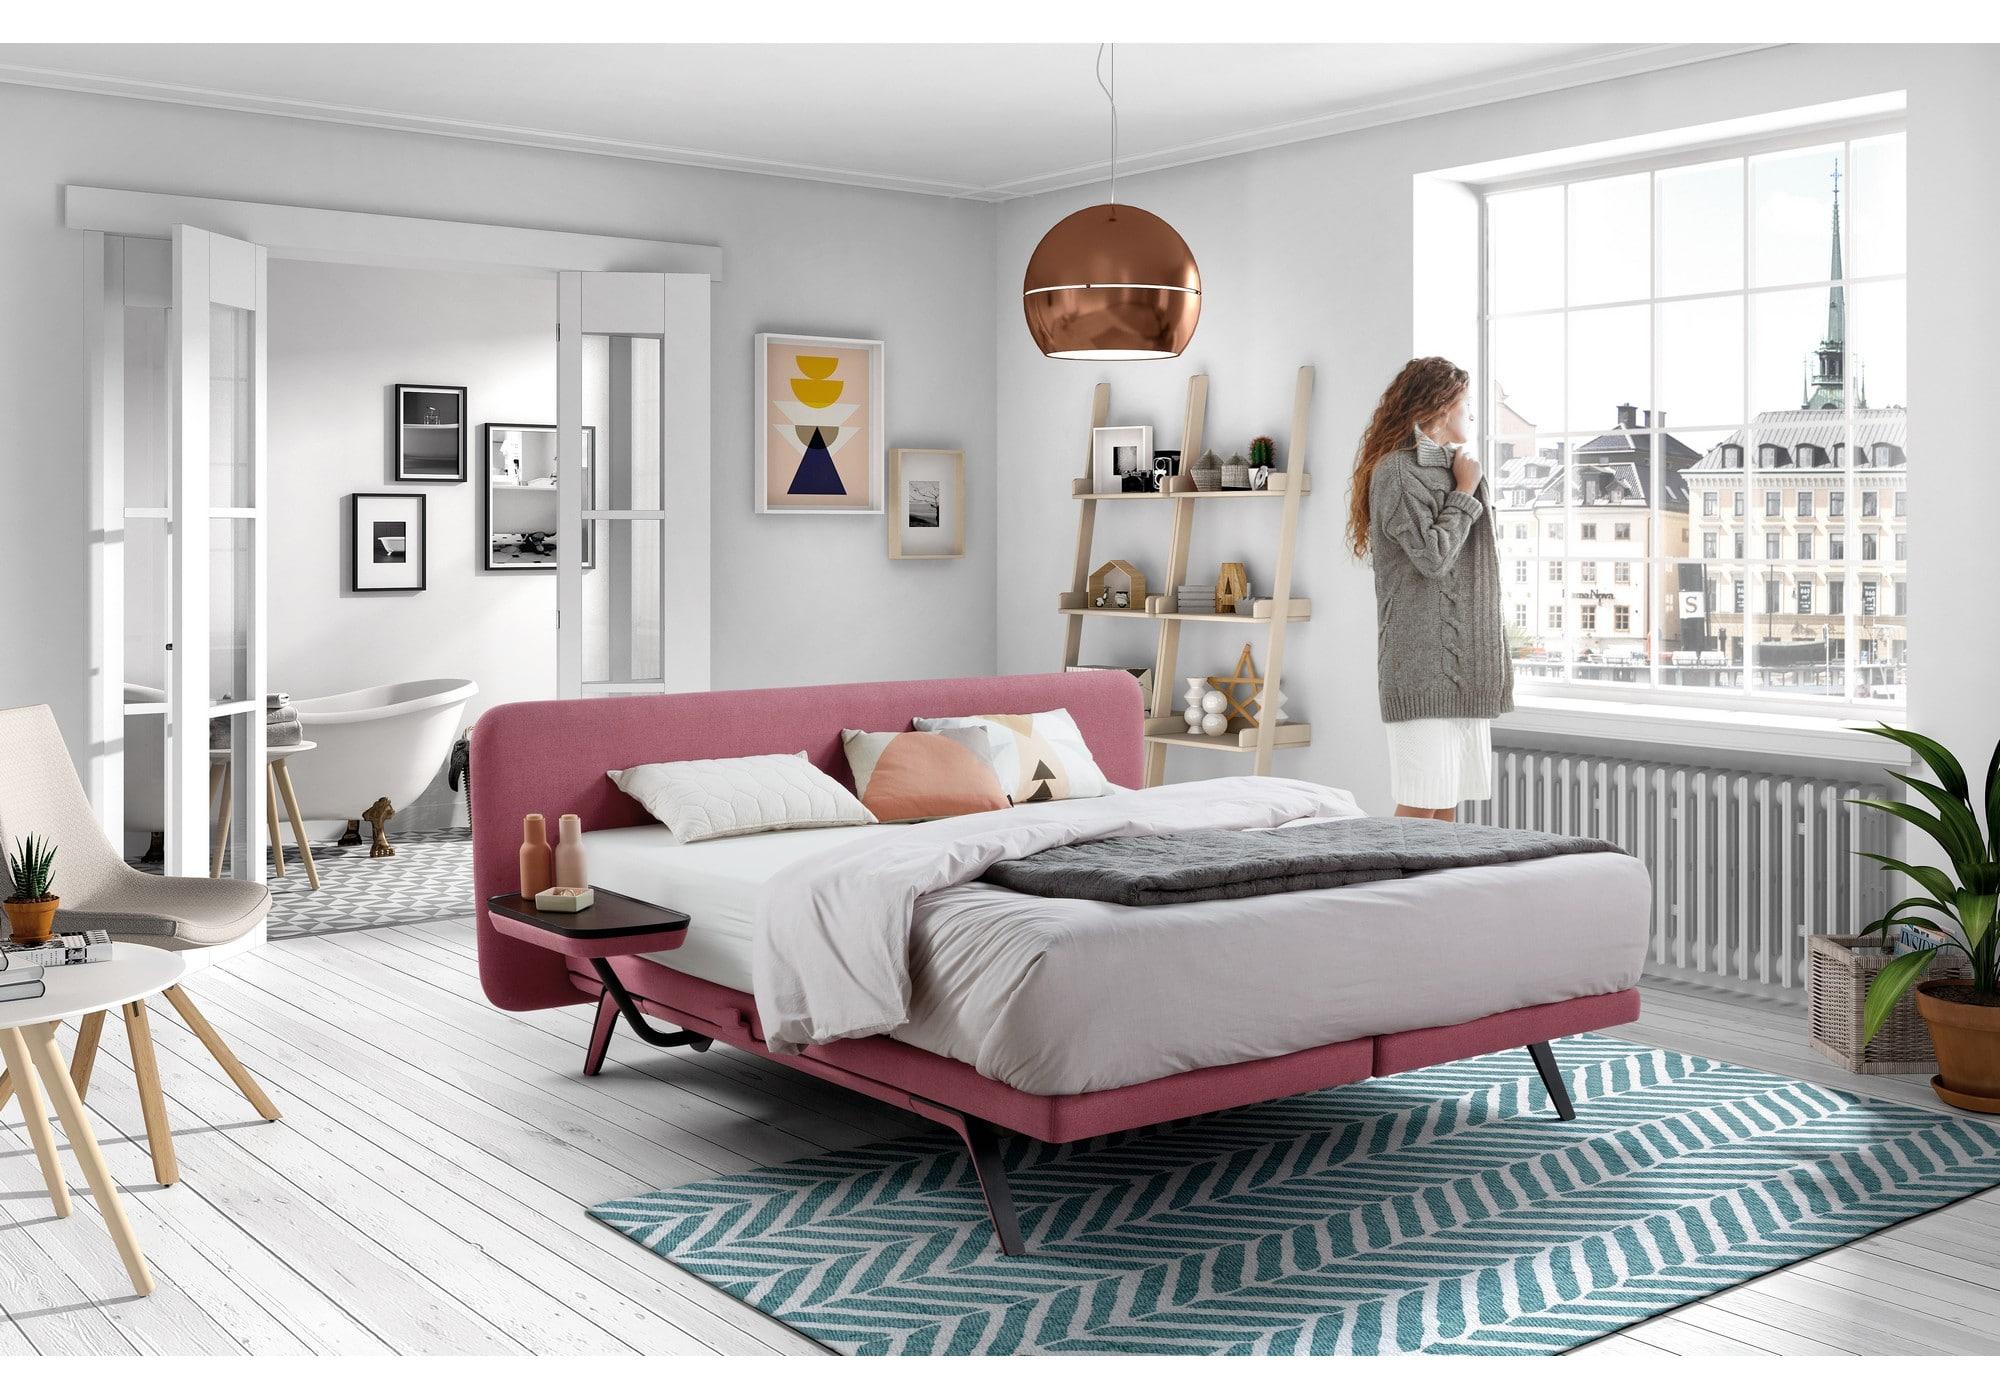 velda boxspringbett finesse betten kraft. Black Bedroom Furniture Sets. Home Design Ideas